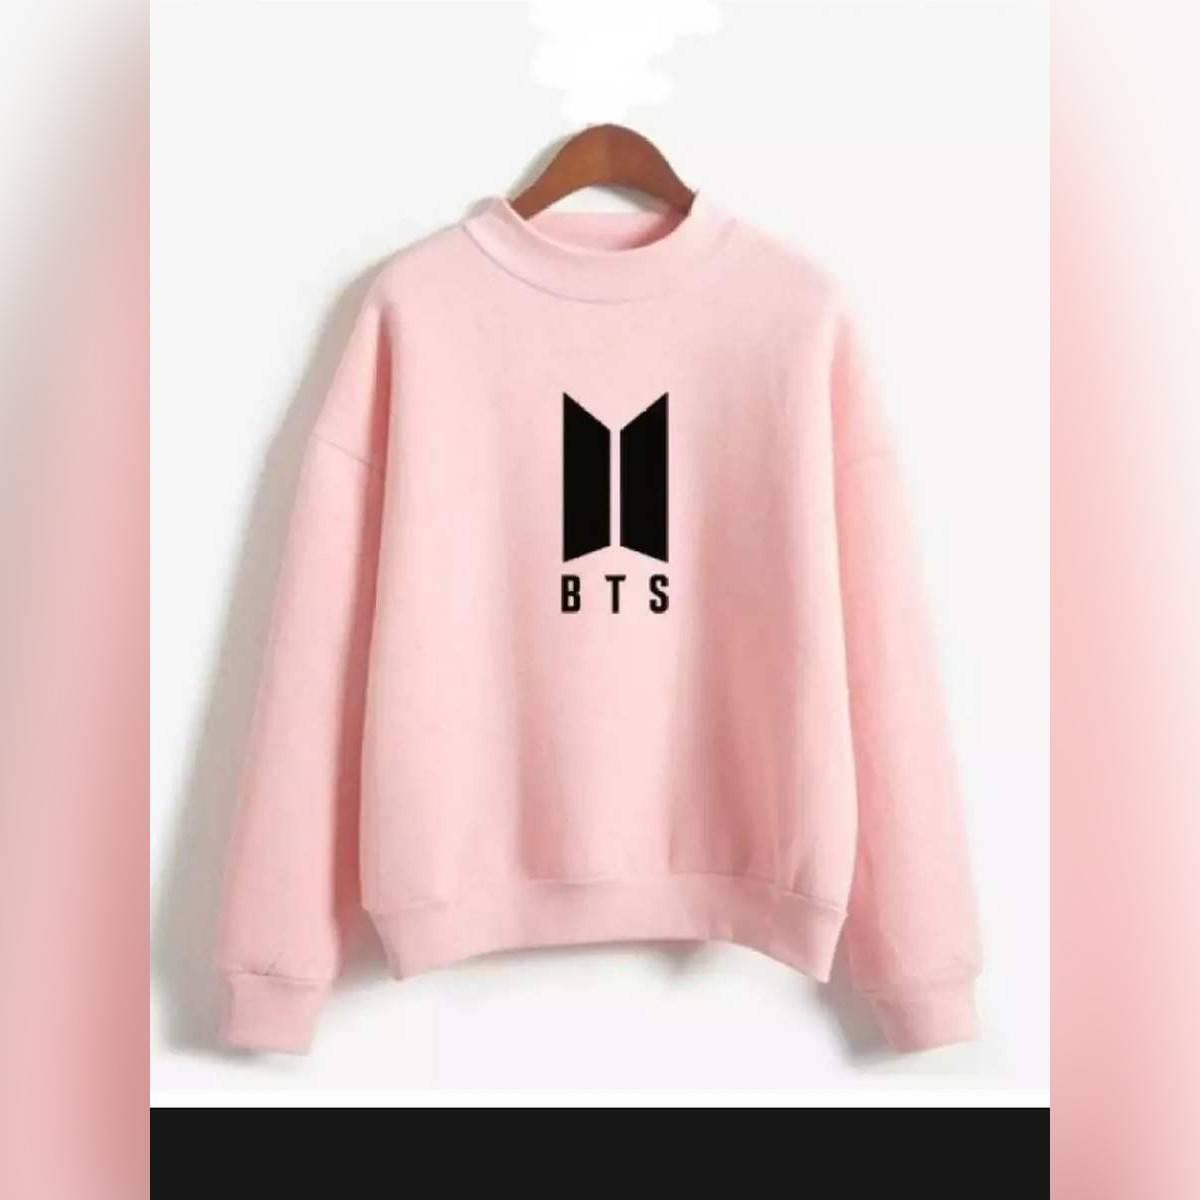 Light pink  BTS printed Sweatshirt for girls